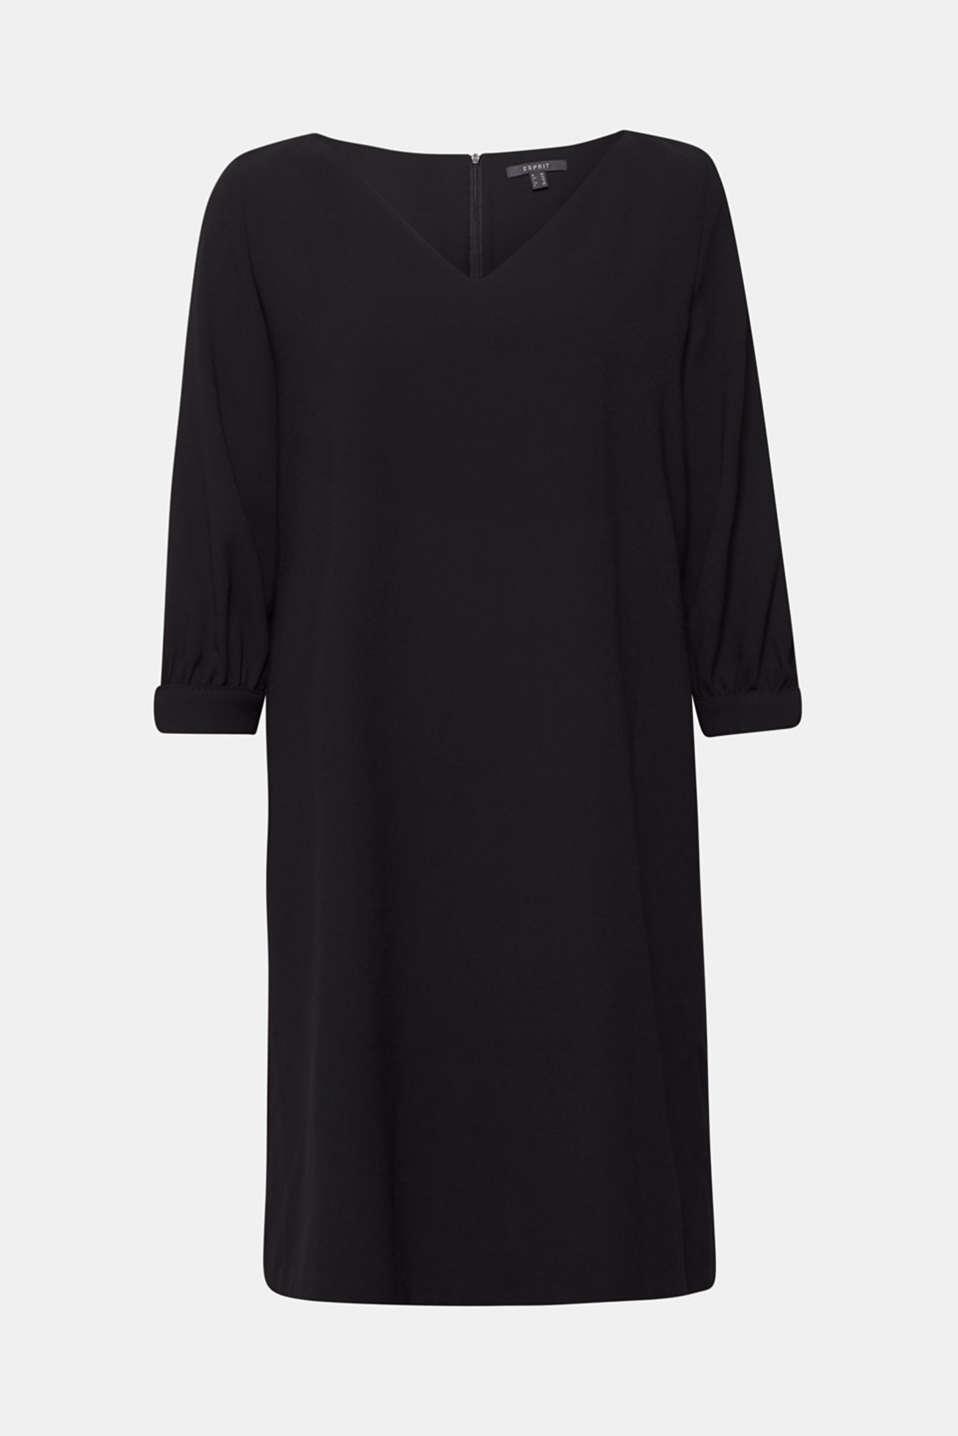 Flowing crêpe dress, BLACK, detail image number 0